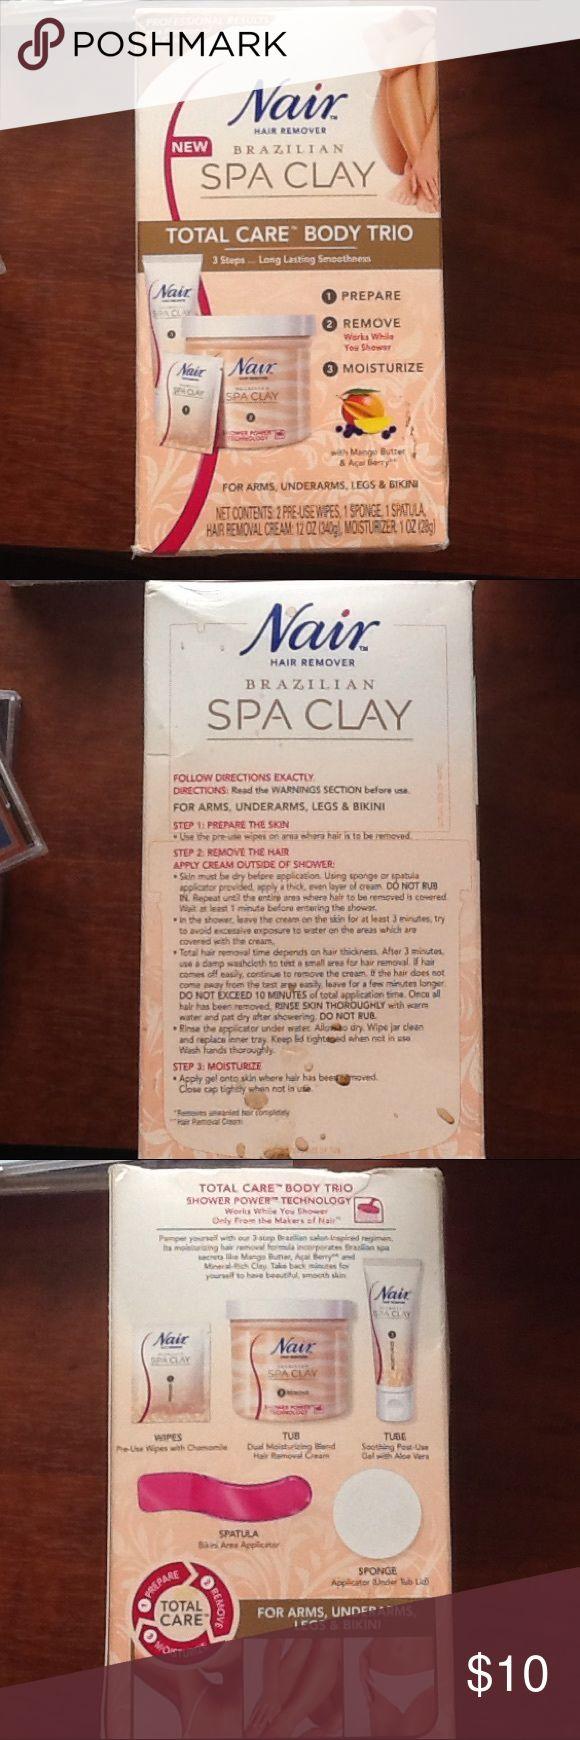 Nair Hair Remover Brazilian Spa Clay Total Care Nair Hair Remover Brazilian Spa Clay Total Care  Body Trio  For arms, underarms, legs, & bikini Nair Makeup